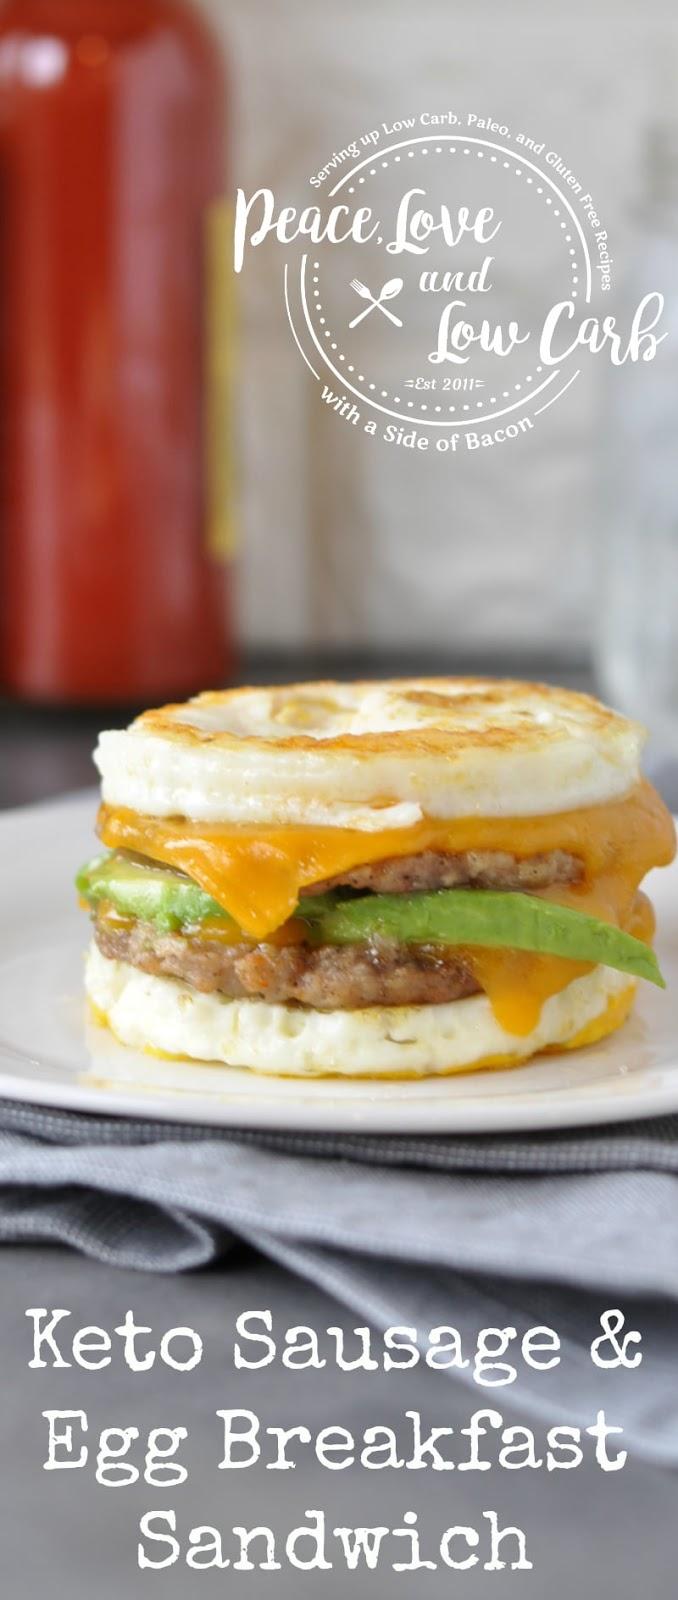 KETO SAUSAGE AND EGG BREAKFAST SANDWICH RECIPE